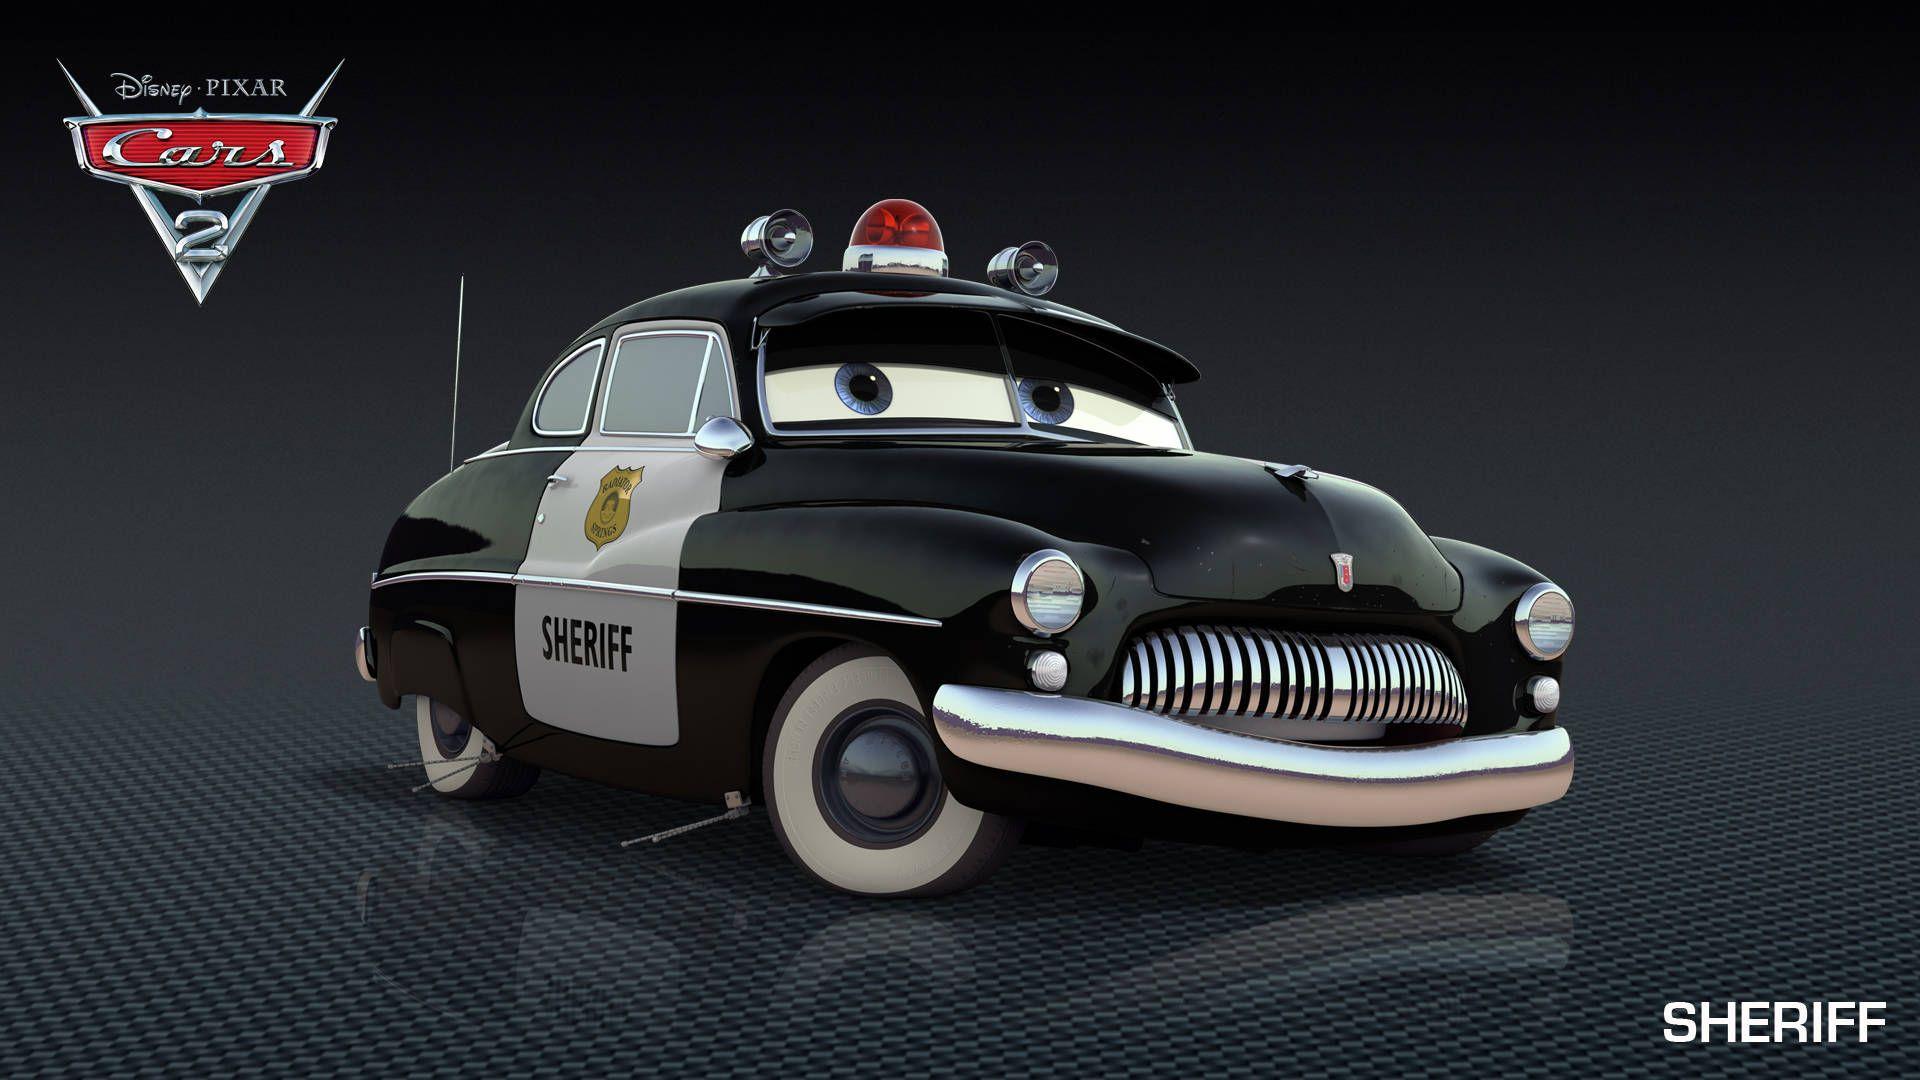 Cars 2 Characters Cars From Pixar Pinterest Cars Disney Cars